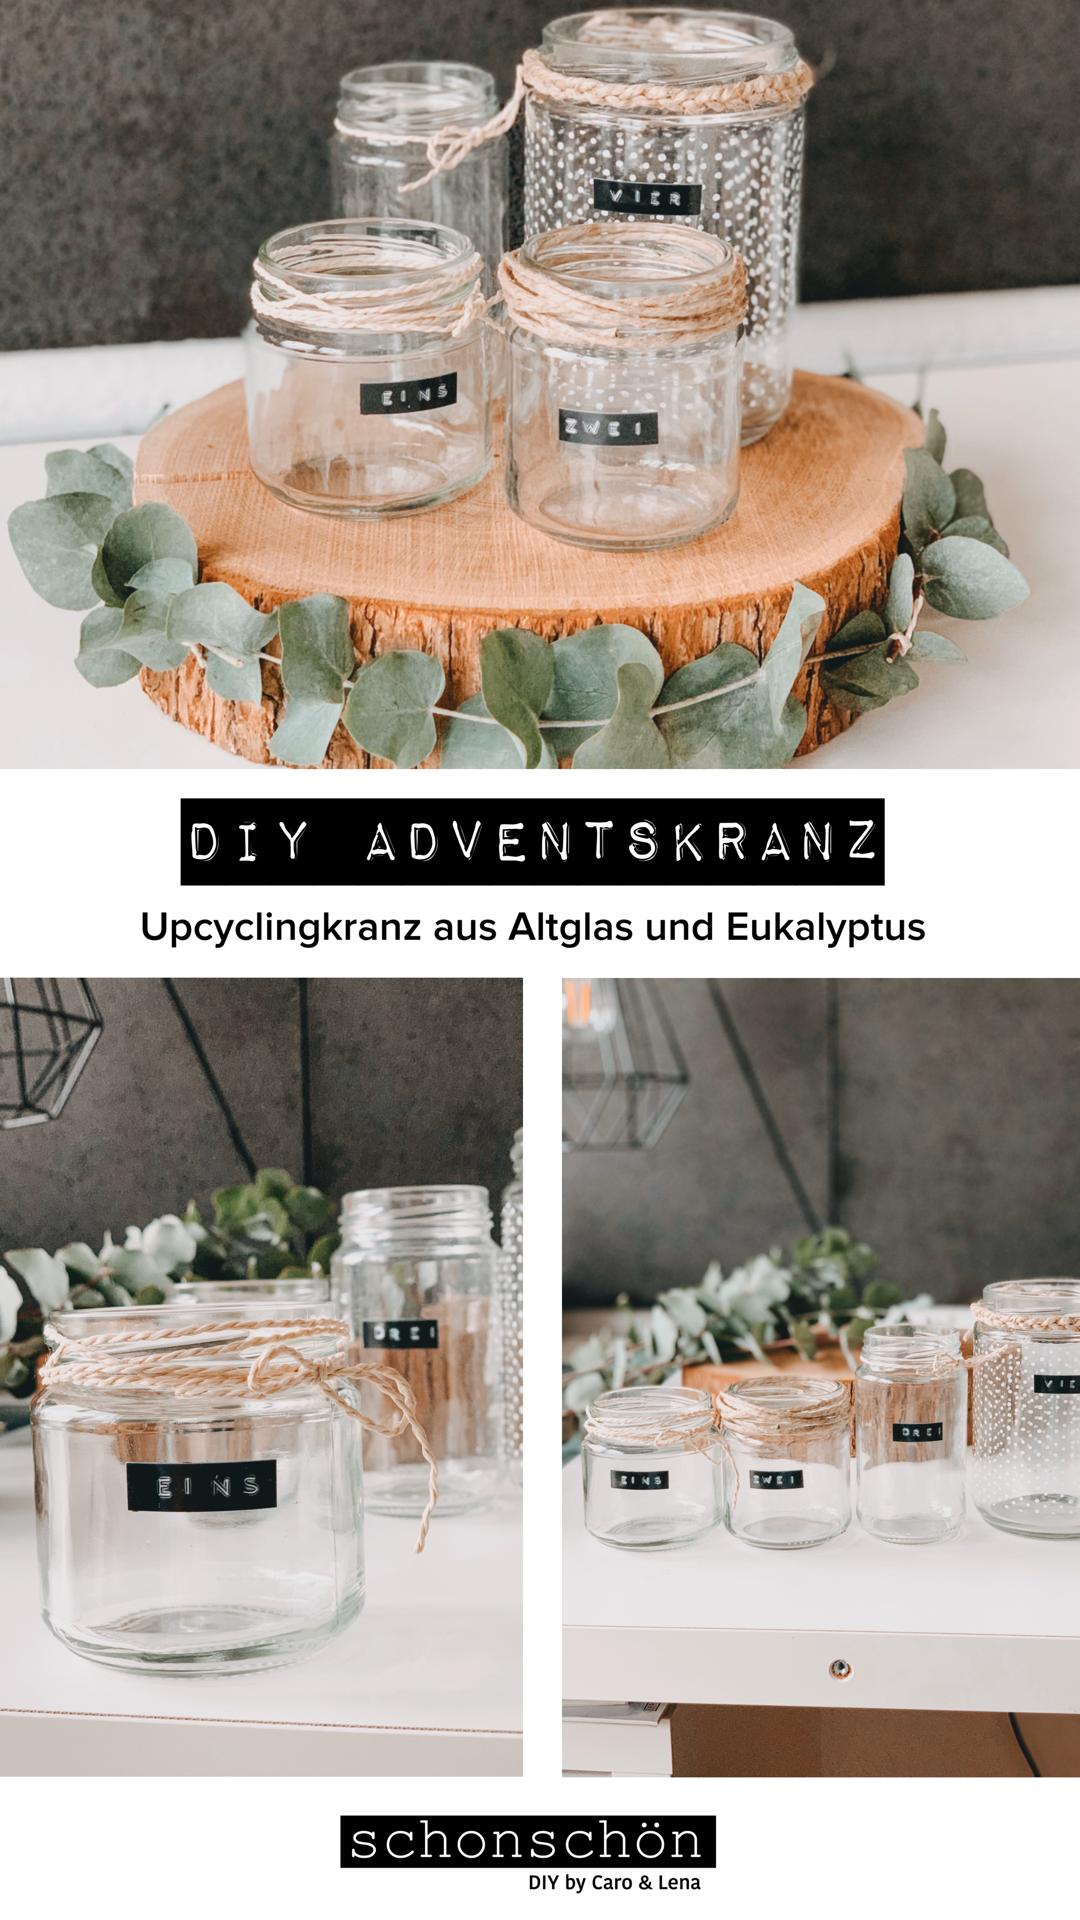 DIY Adventskranz Upcyclingkranz